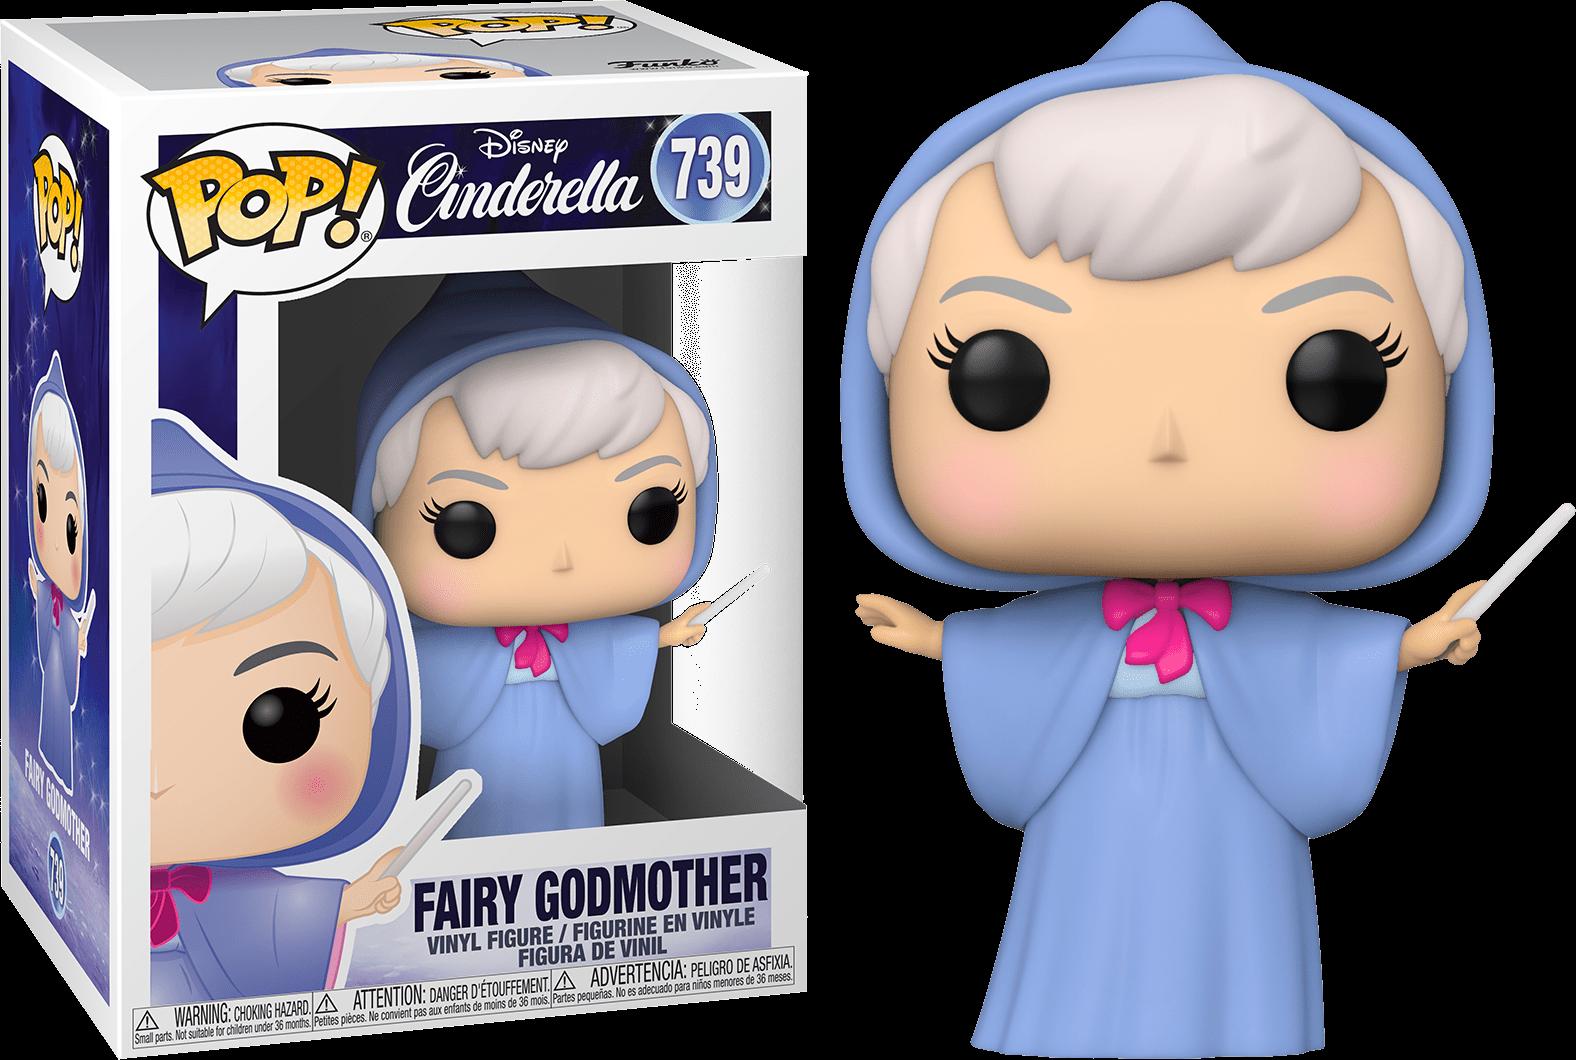 Funko Pop Disney Cinderella Fairy Godmother Funko Pop Dolls Pop Vinyl Figures Funko Pop Anime